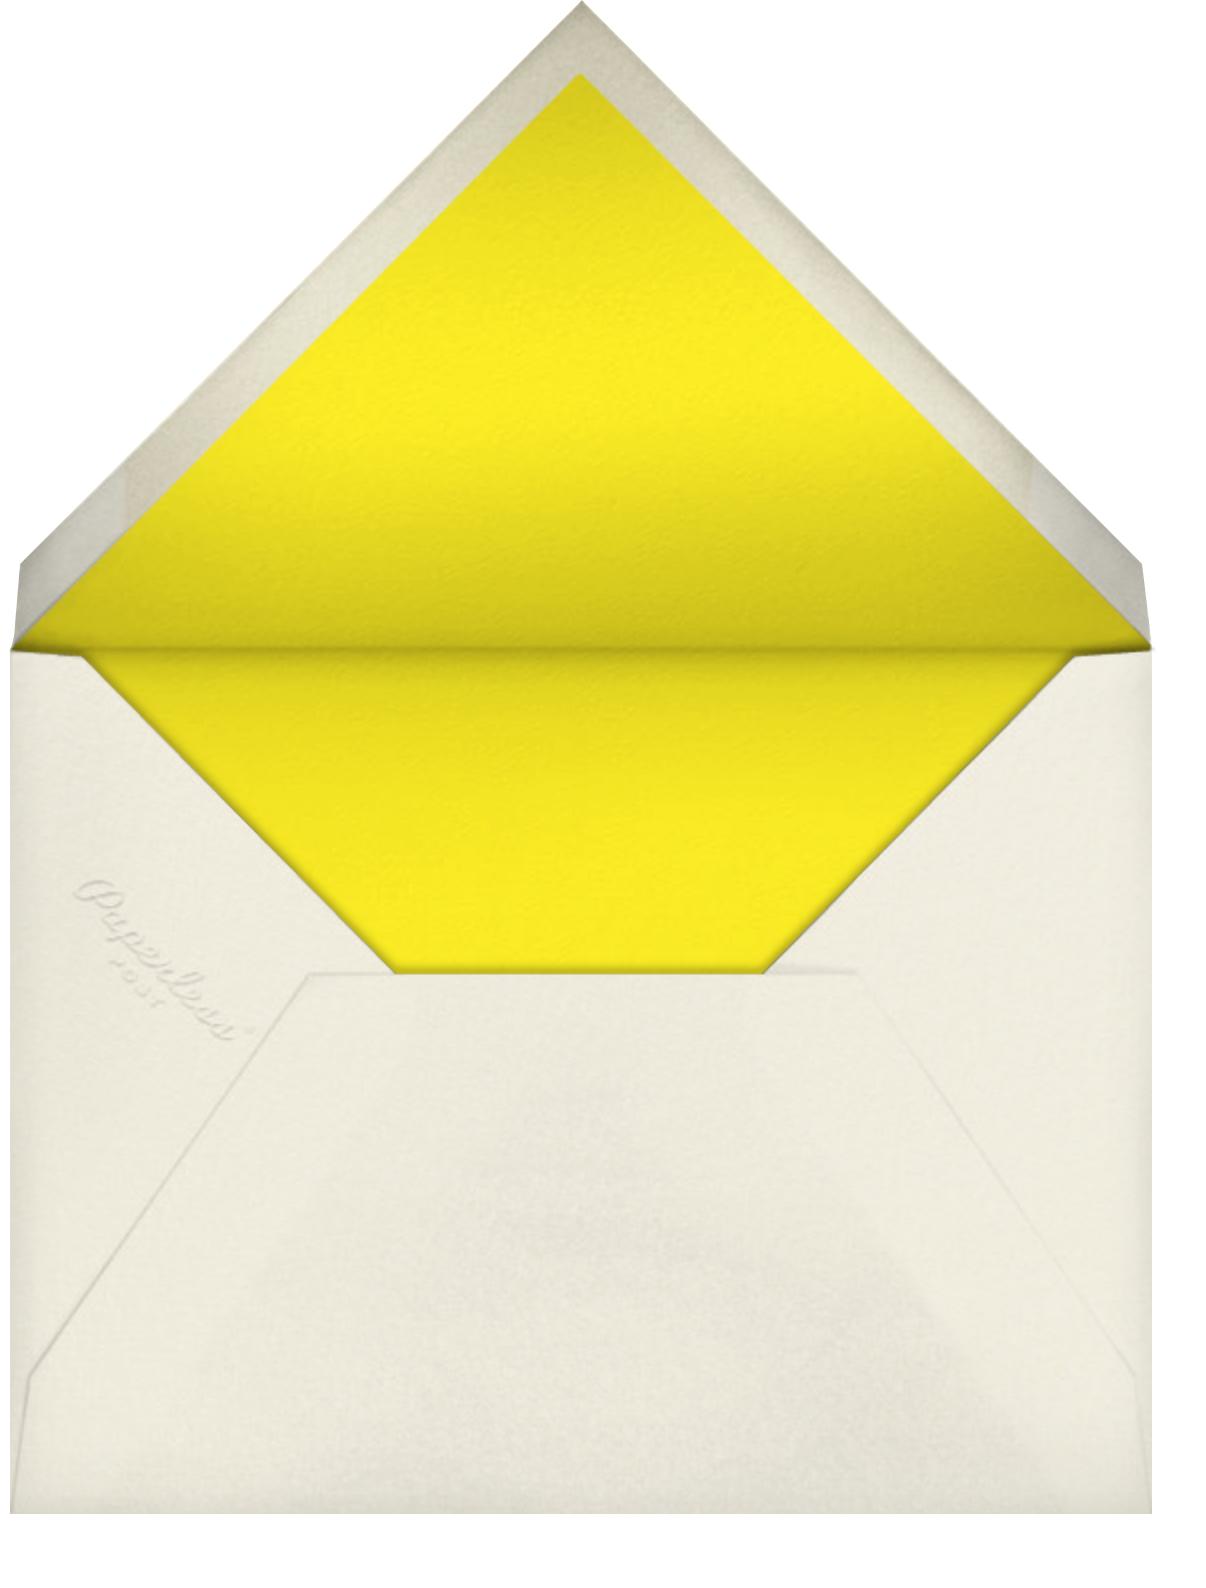 Congrats in Bloom (Danielle Kroll) - Red Cap Cards - Congratulations - envelope back